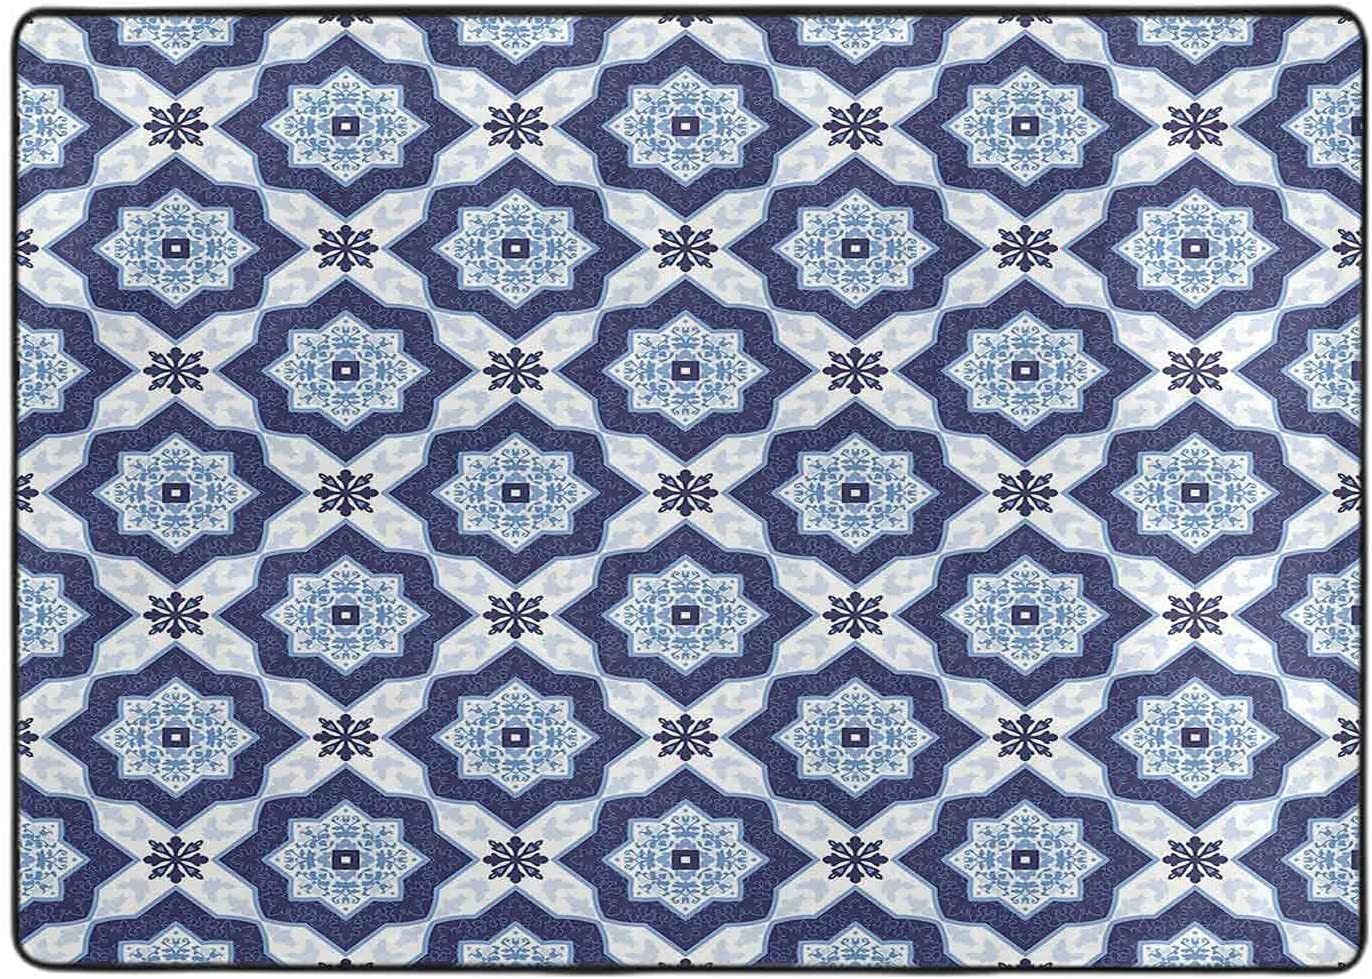 Carpet for Bedroom Philadelphia Mall Traditional Azulejo Vintage Price reduction Portuguese Tile